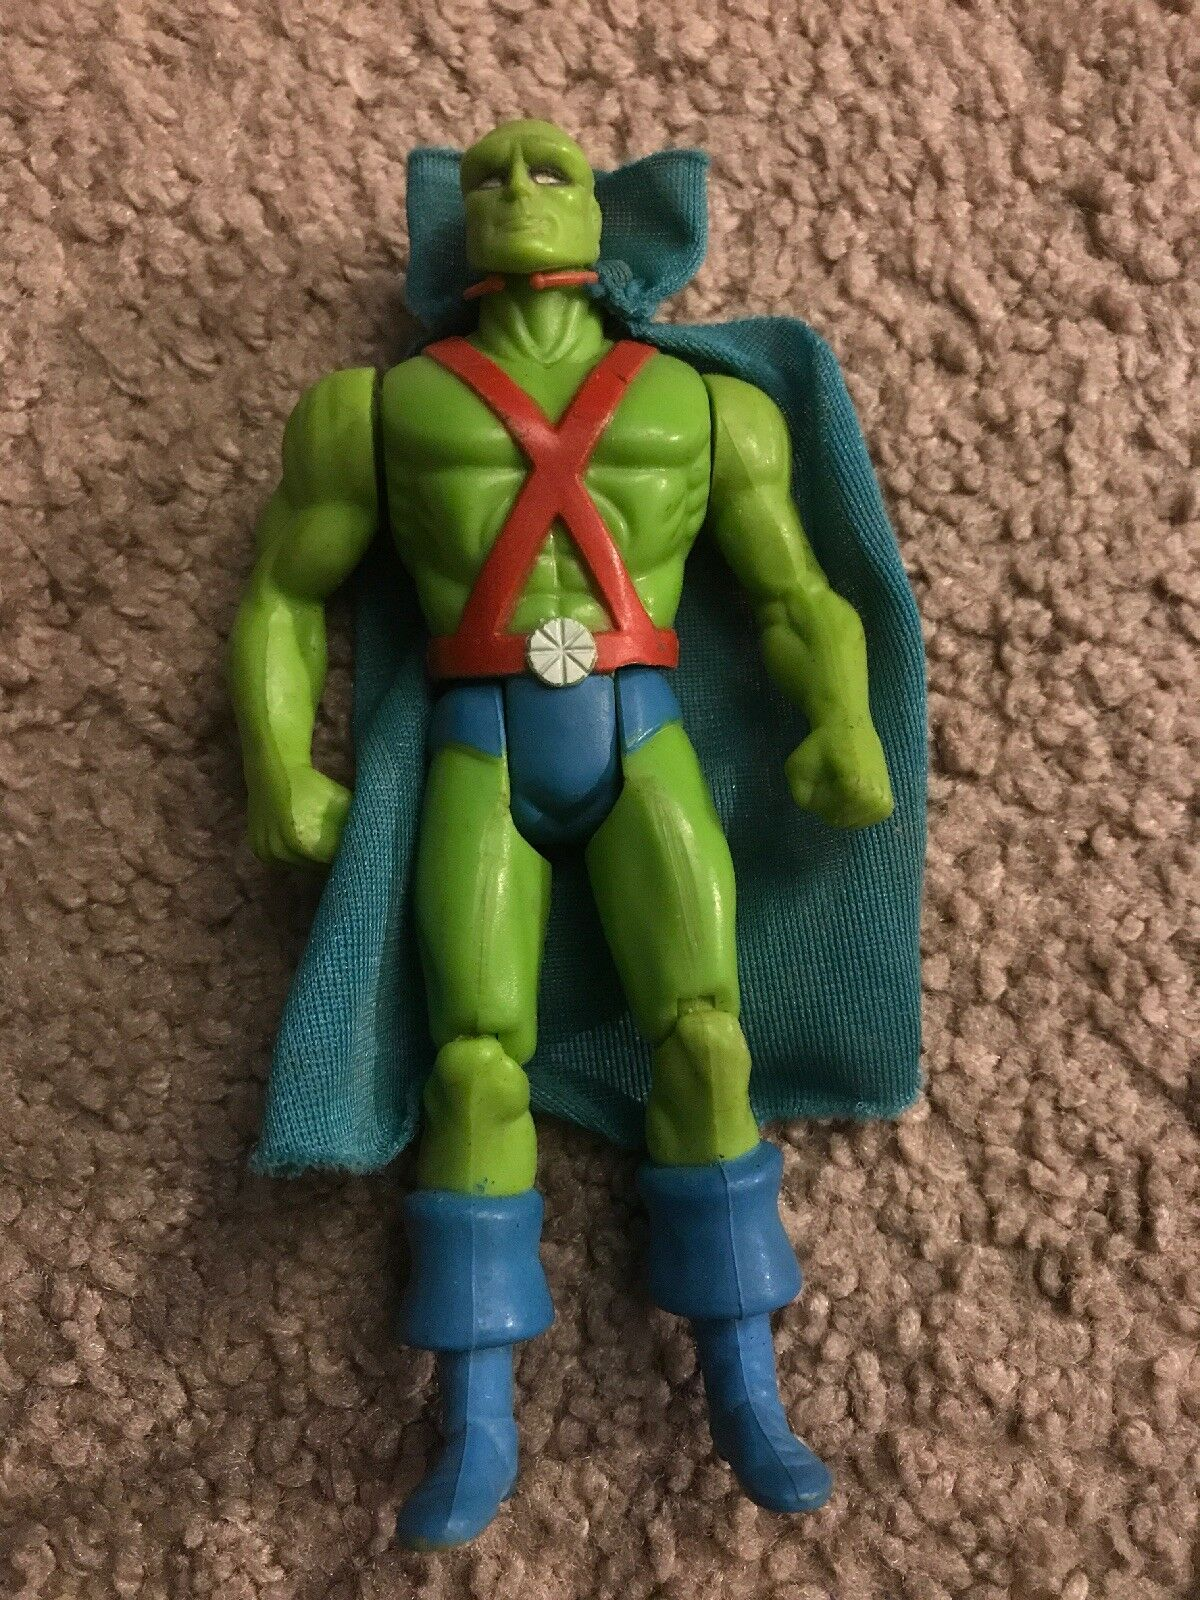 Vintage DC 1985 Kenner Super Powers Martian Manhunter Cape Action works great